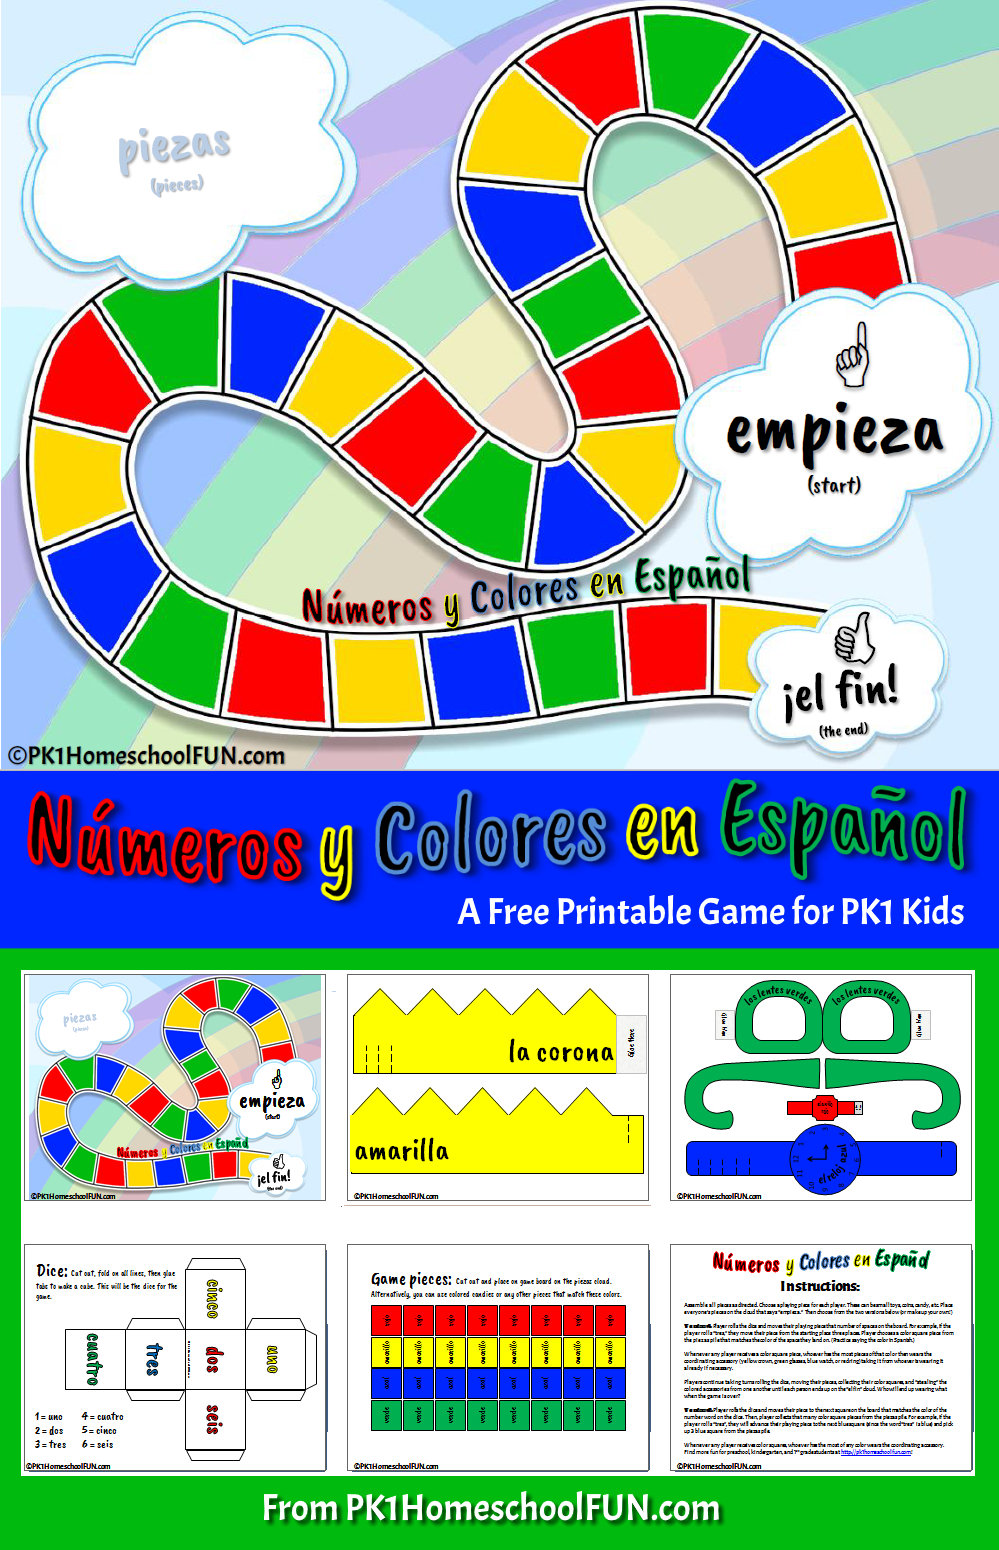 Free Printable Spanish Numbers & Colors Game - Pk1Homeschoolfun - Free Printable Spanish Numbers